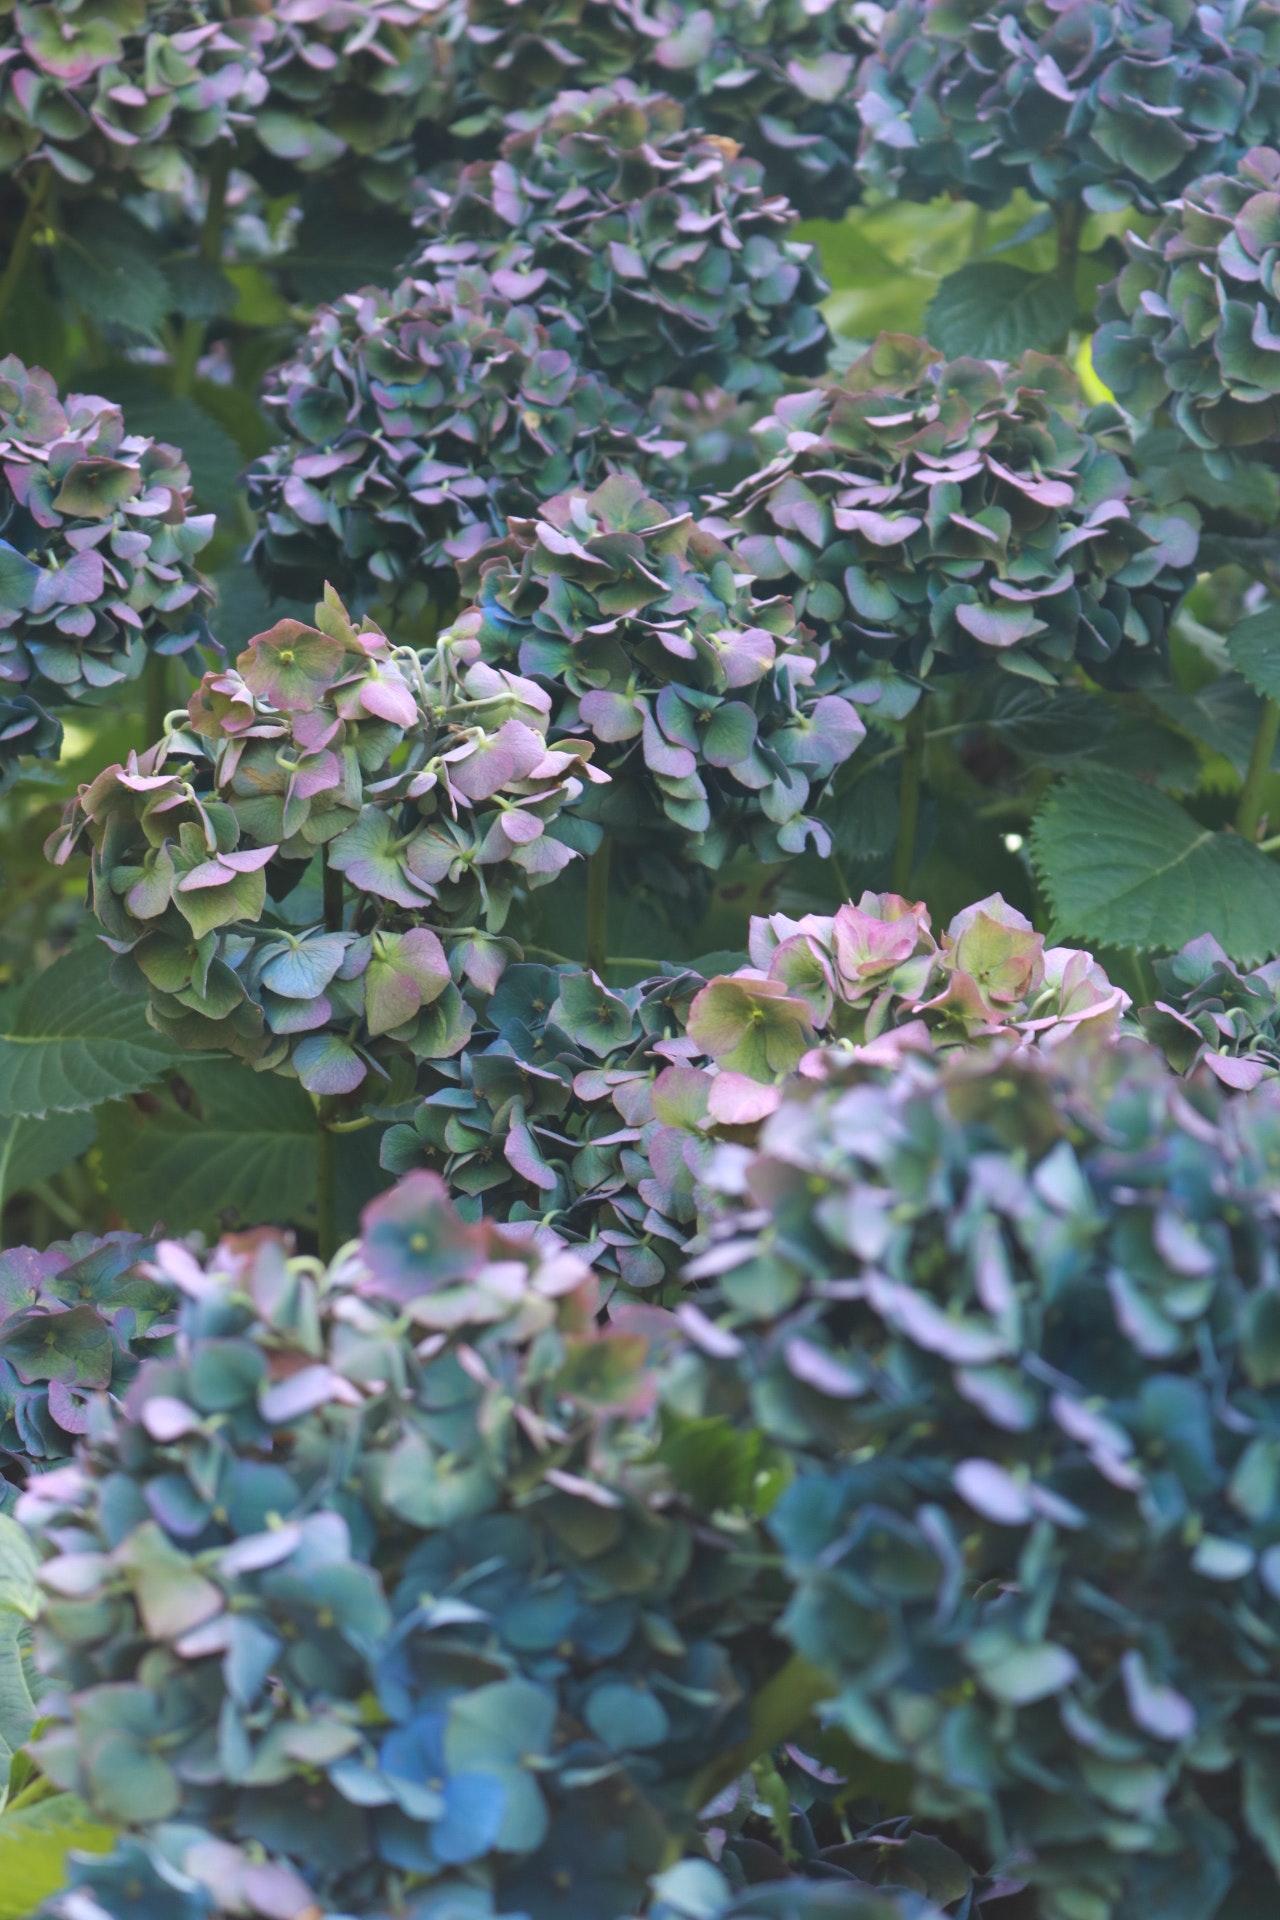 metallic, shimmery blue and purple hydrangea in the garden